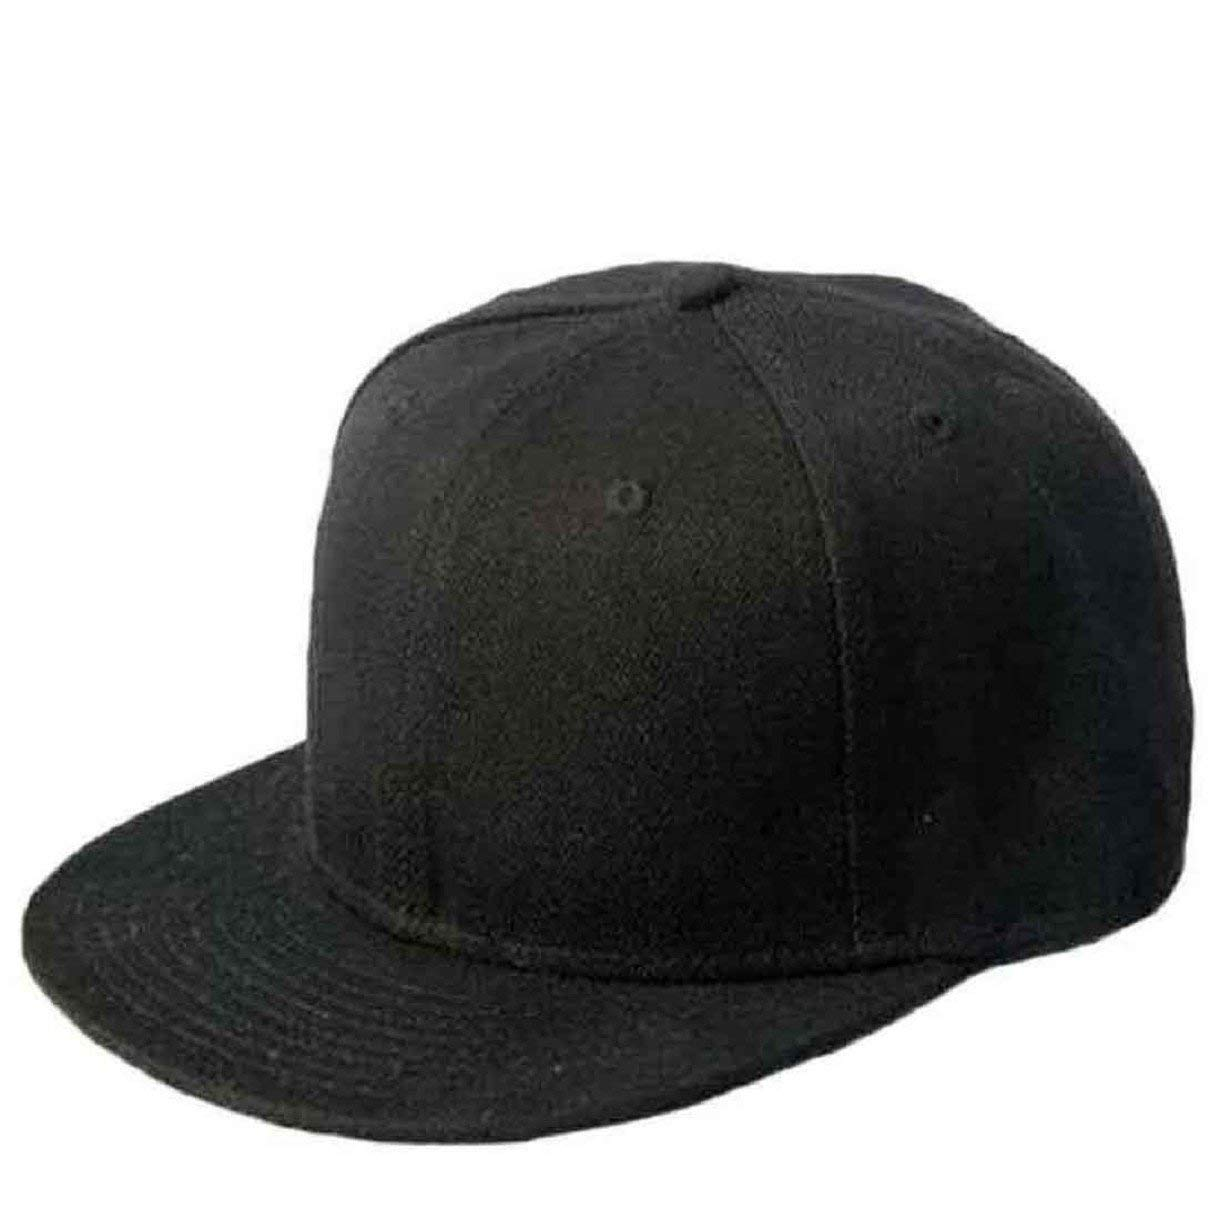 00b83590 Cheap Plain Snapback Hats, find Plain Snapback Hats deals on line at ...